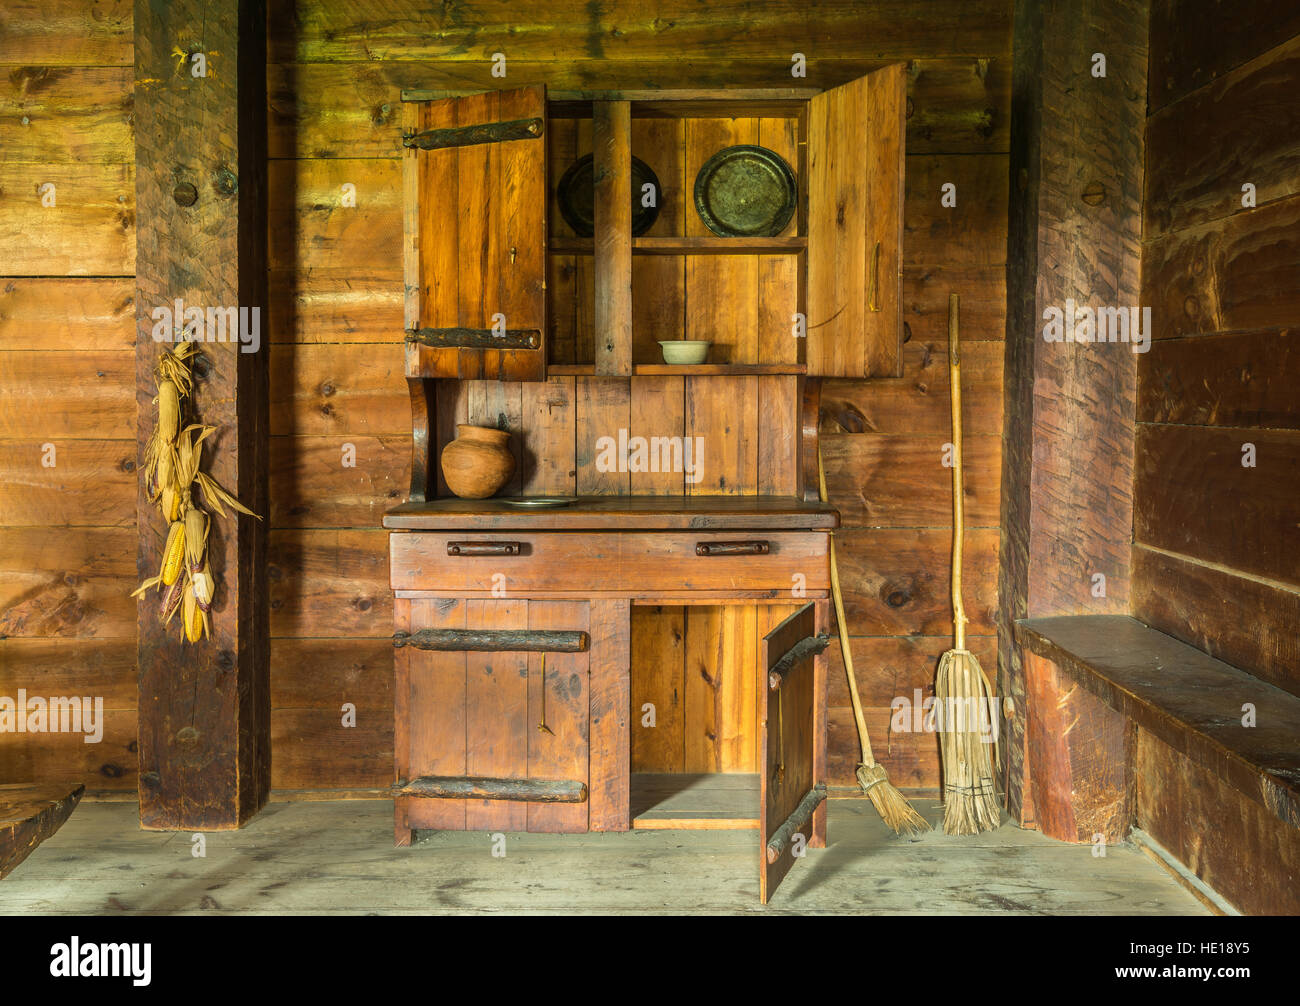 Rustic Pioneer Kitchen - Stock Image